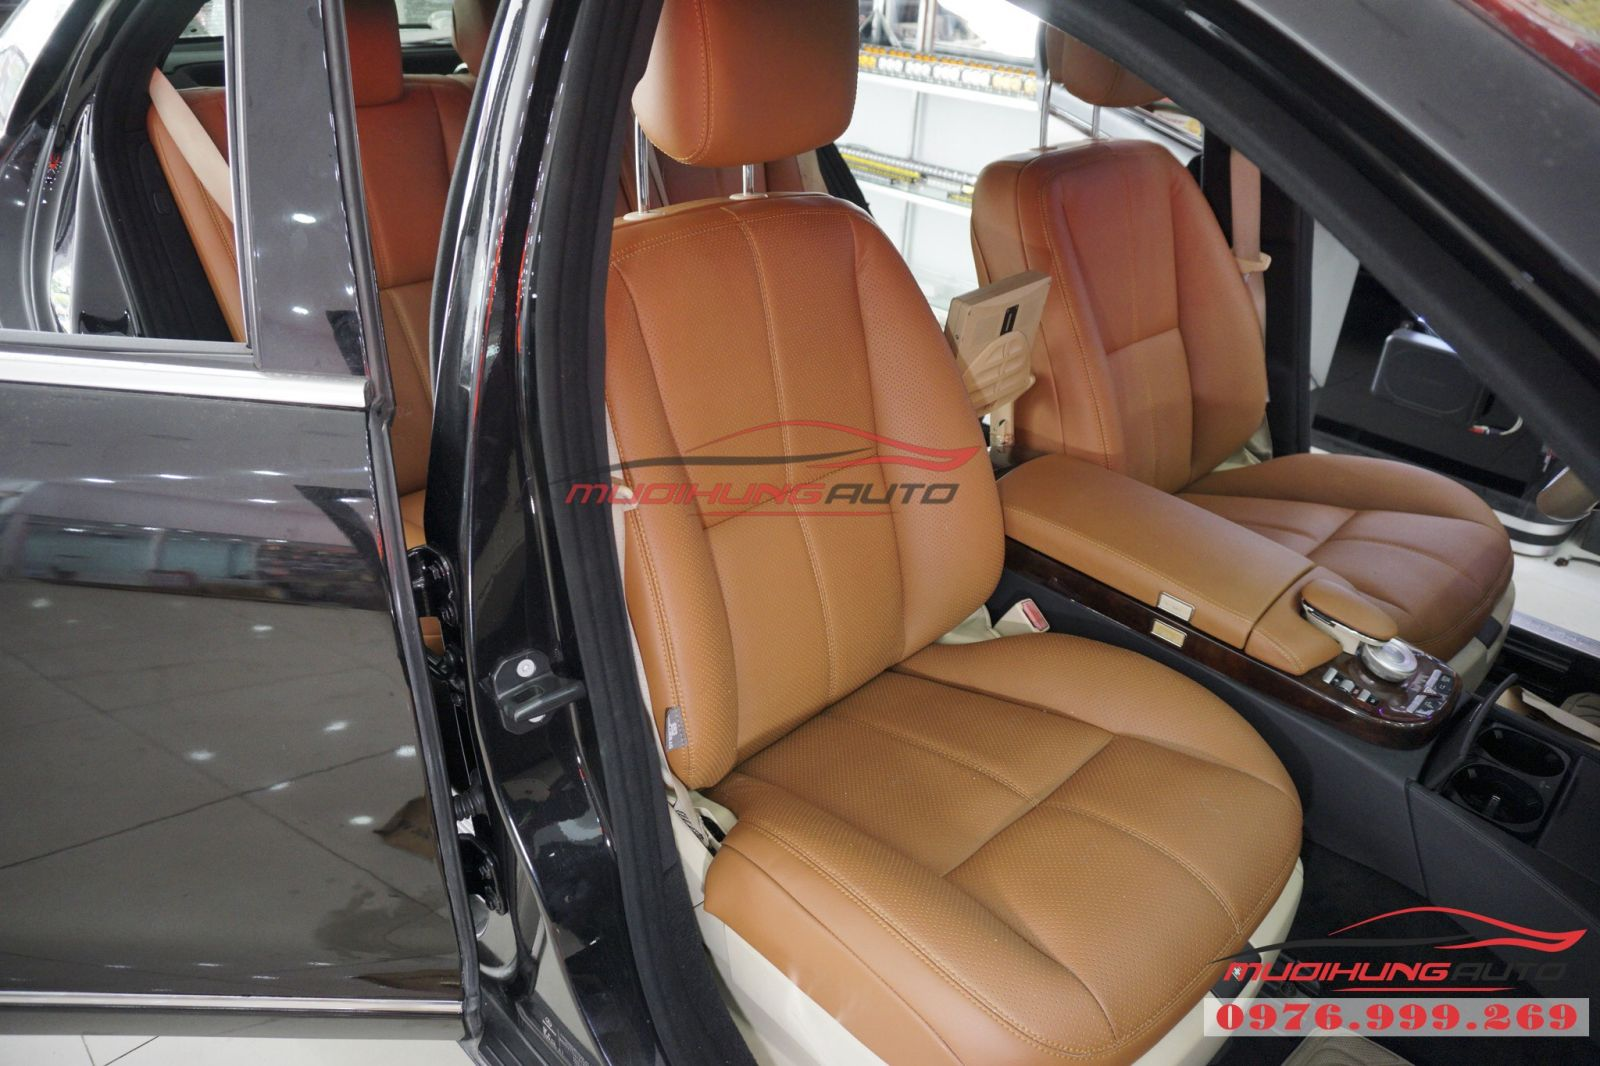 Bọc ghế da cao cấp cho Mercedes Benz giá tốt 01